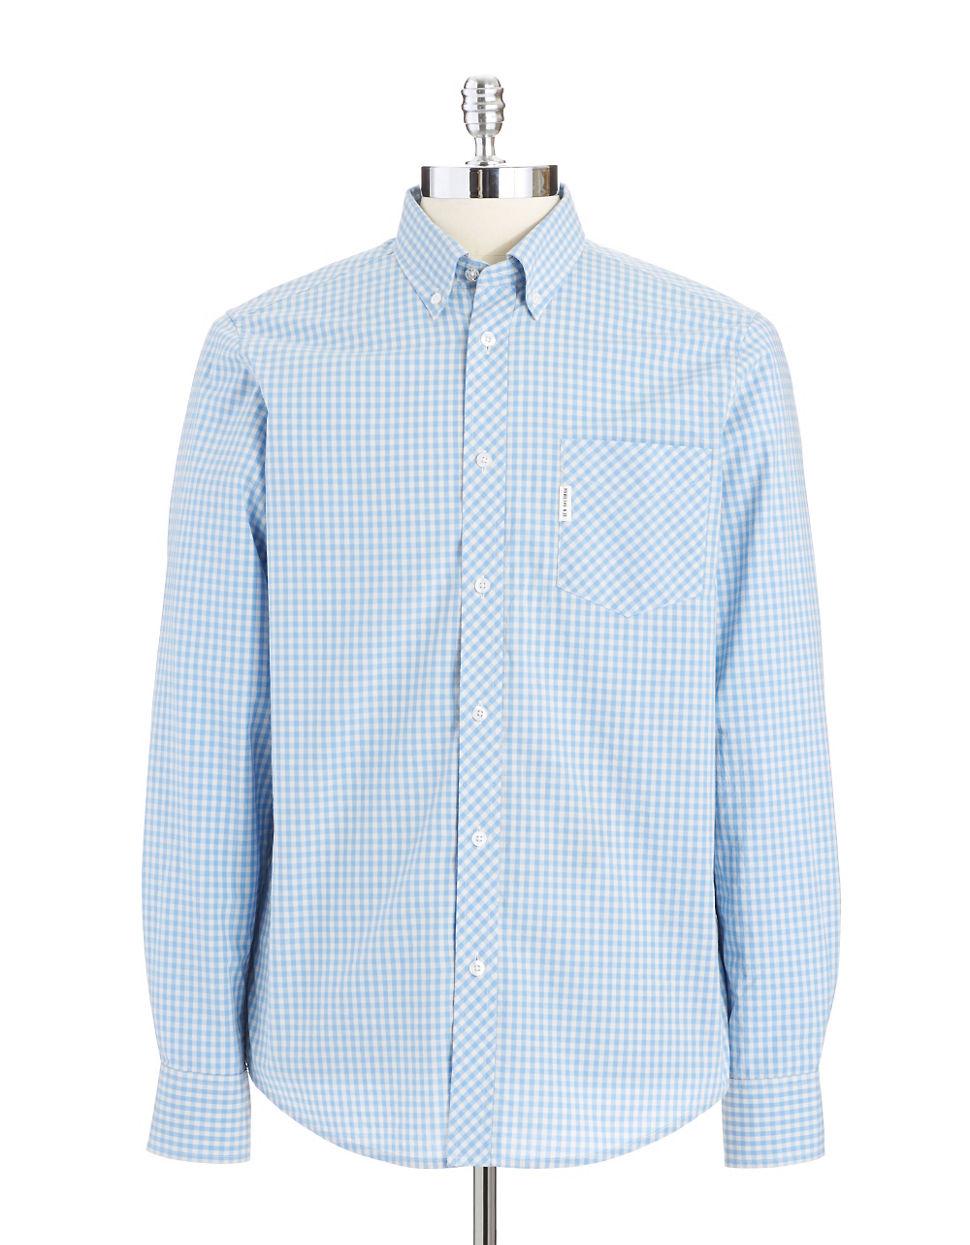 Ben Sherman Gingham Plaid Sportshirt In Blue For Men